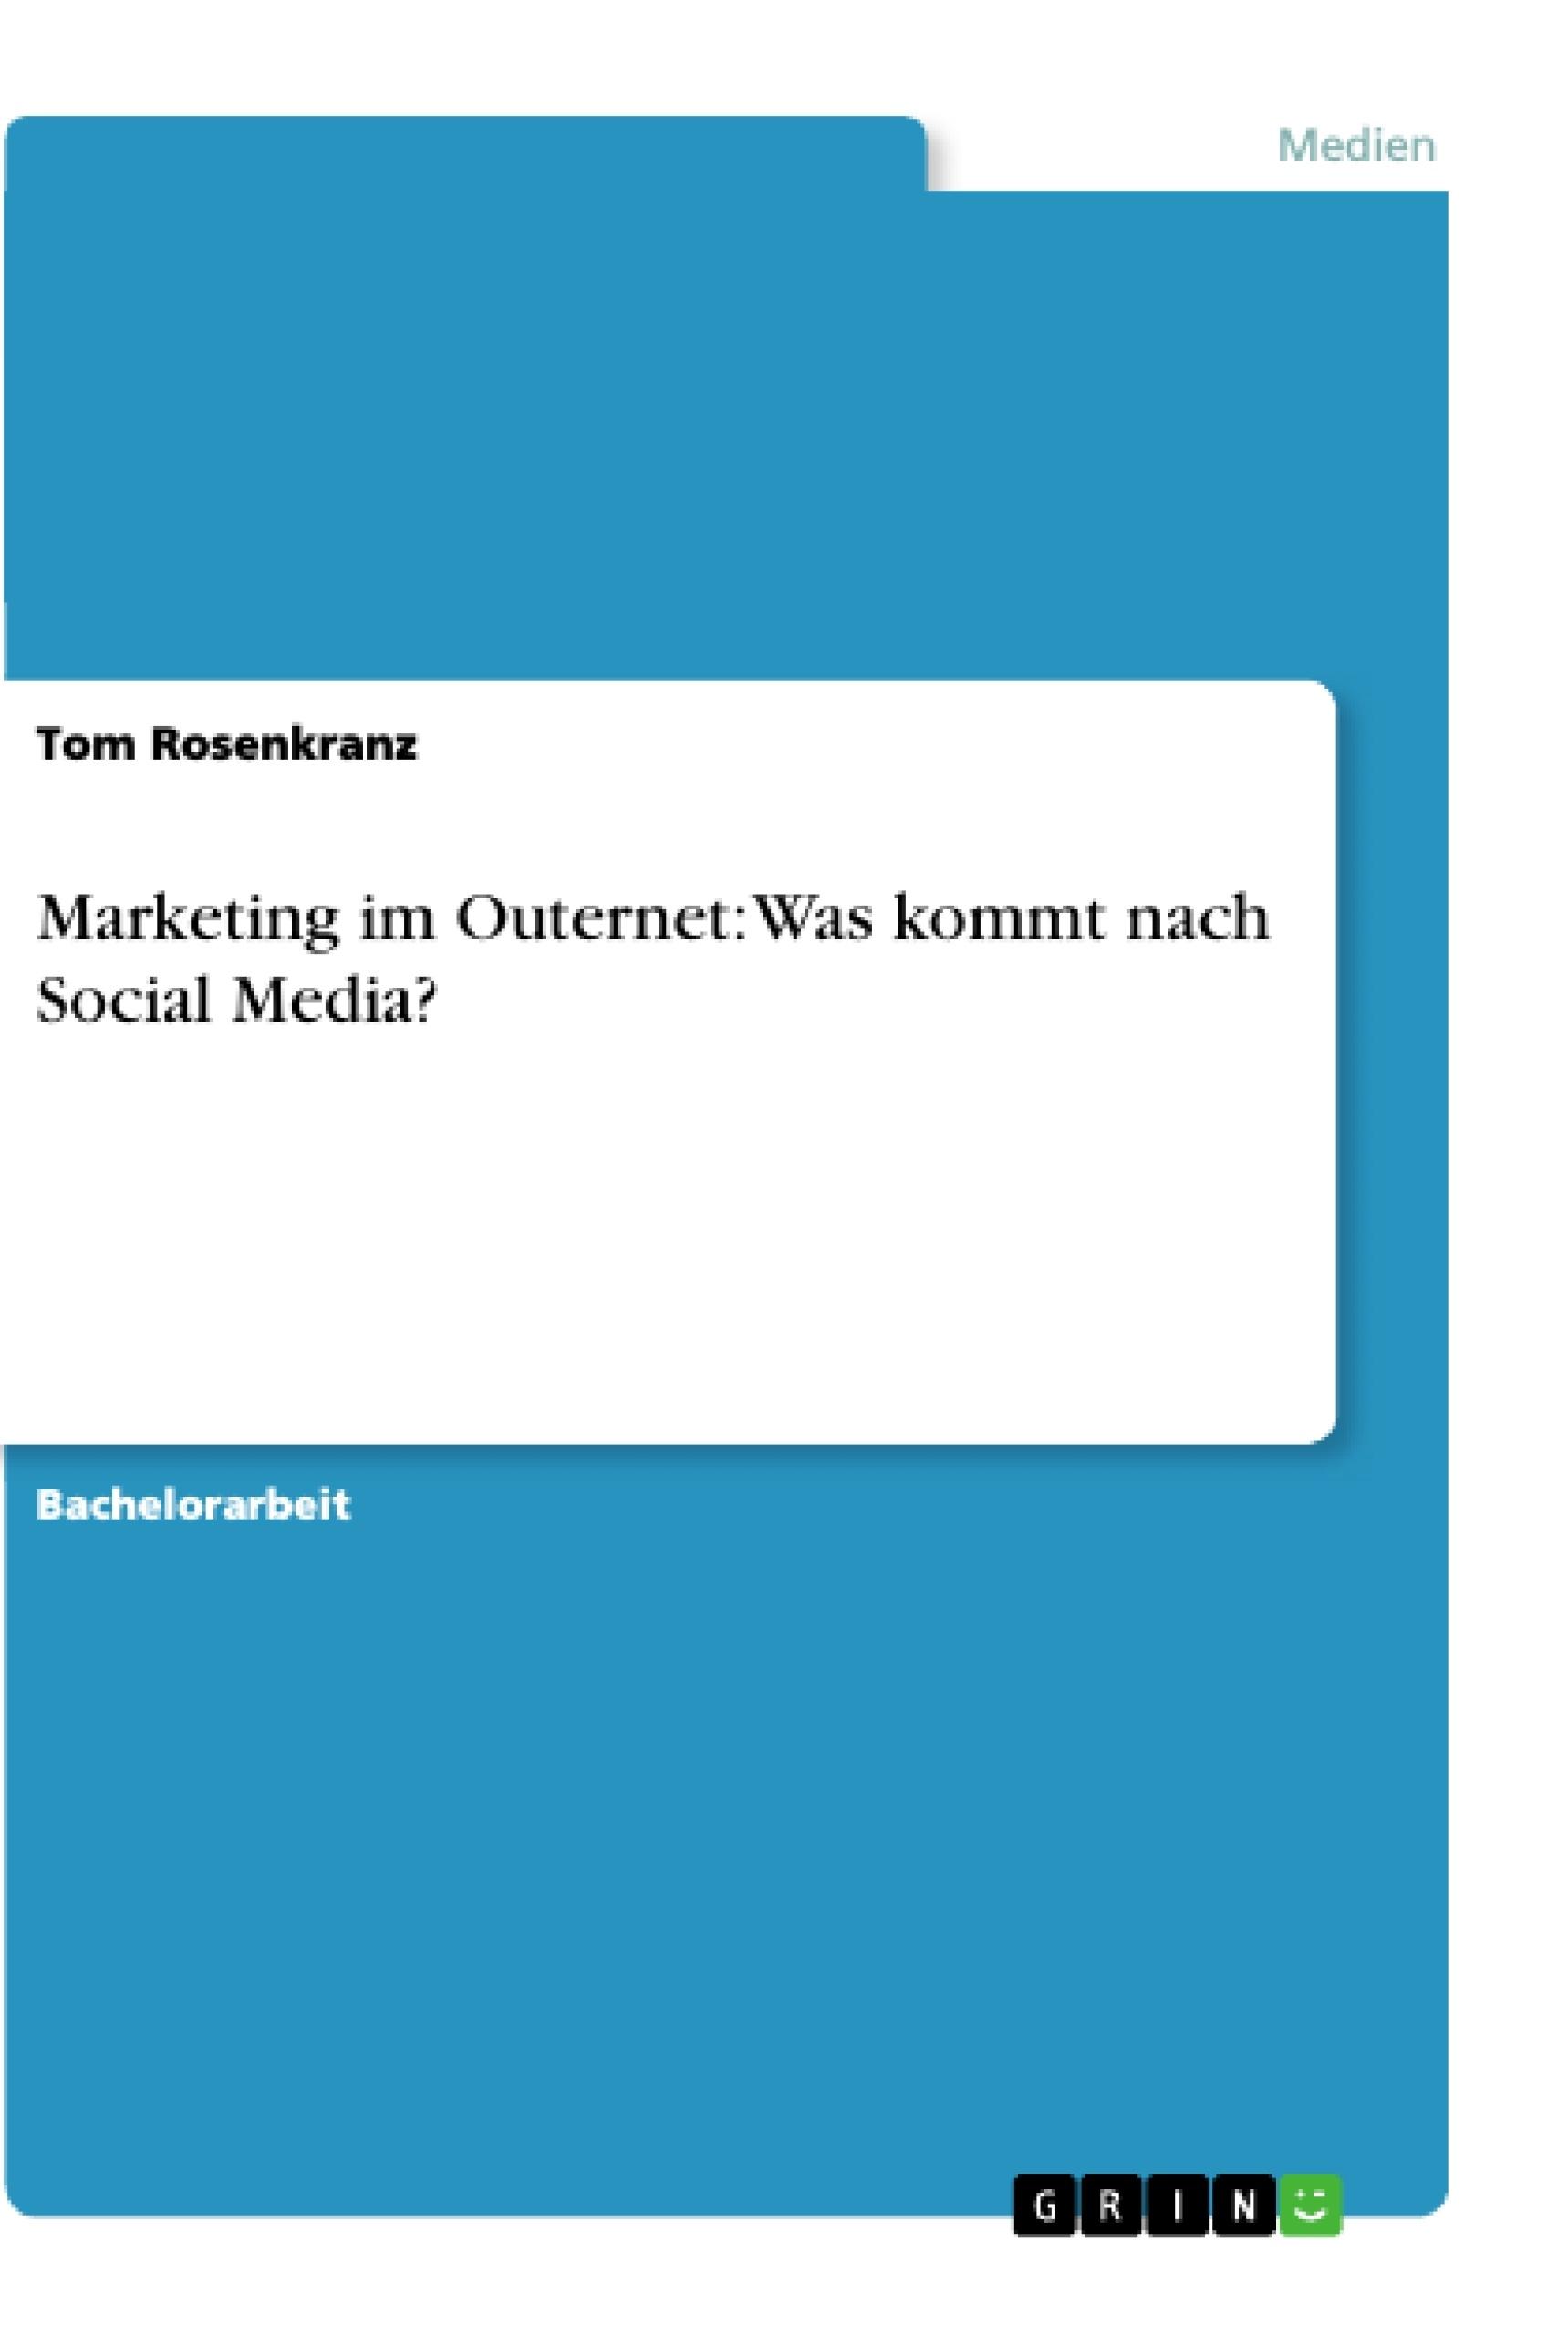 Titel: Marketing im Outernet: Was kommt nach Social Media?